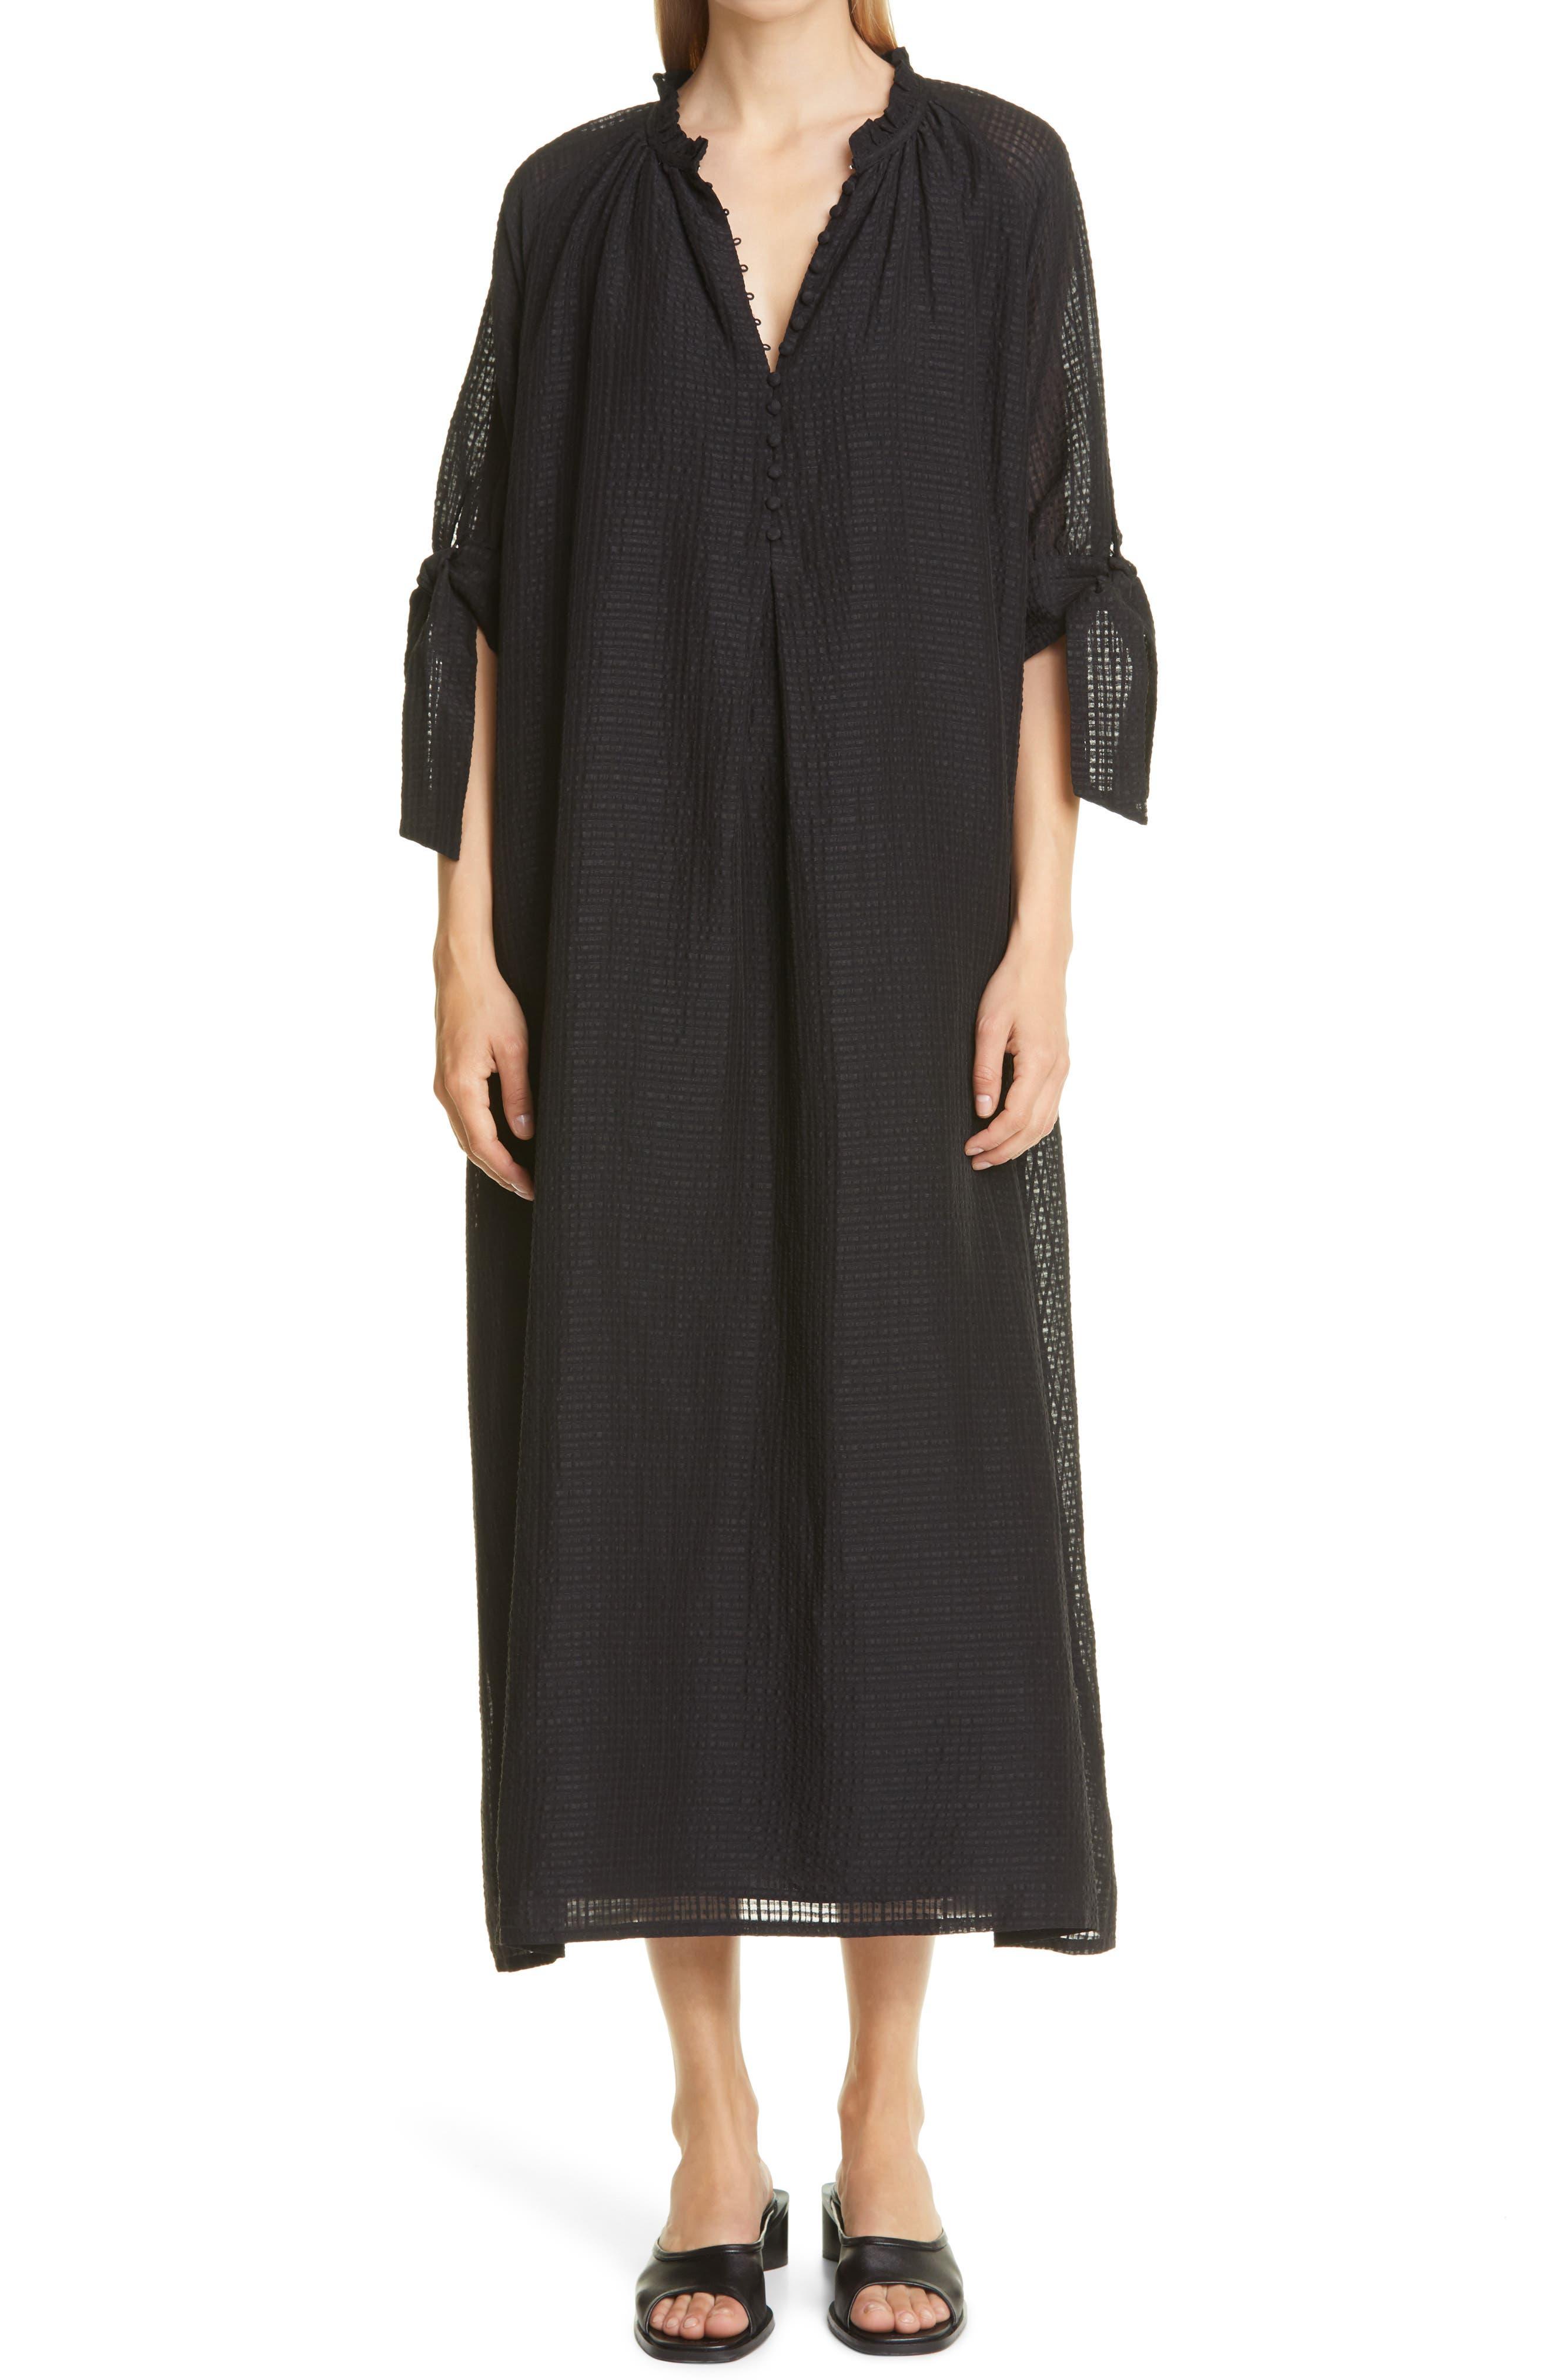 Giselle Tie Sleeve Organic Cotton Dress